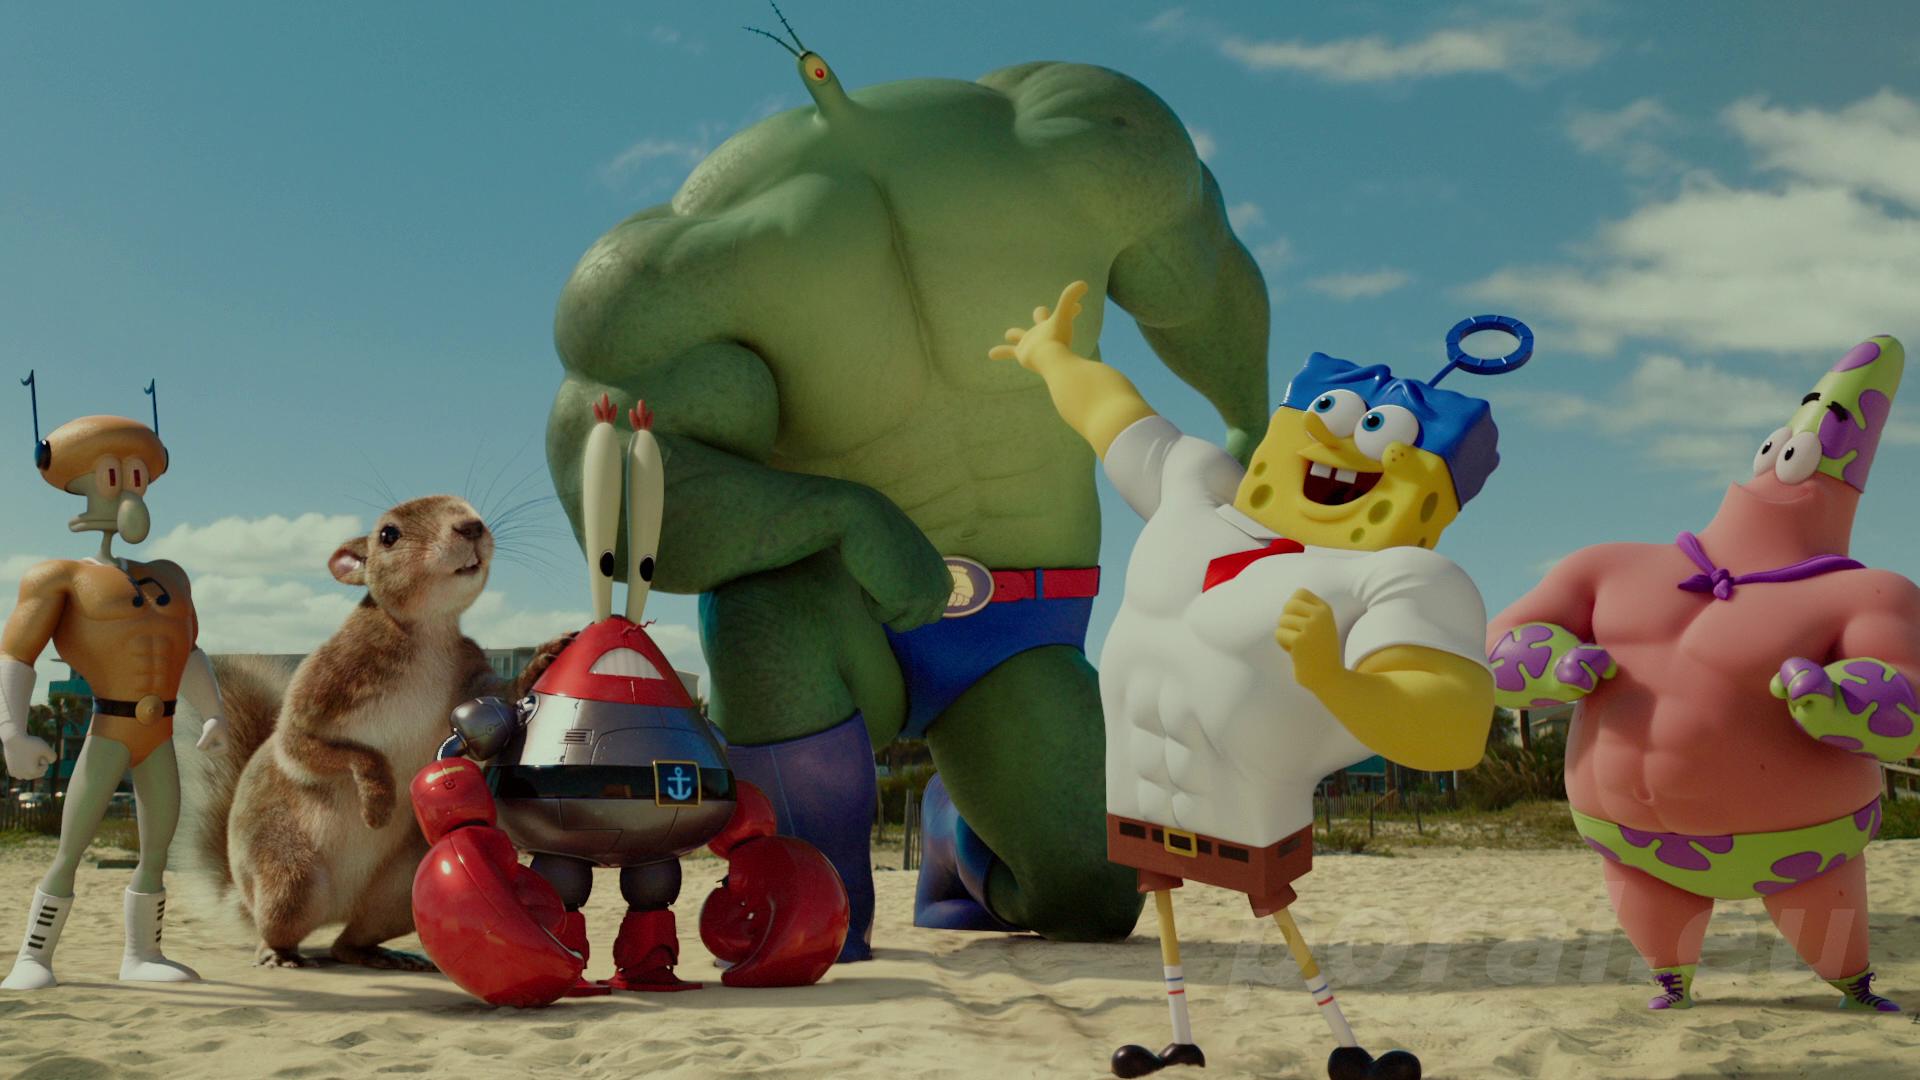 The spongebob movie sponge out of water sandy